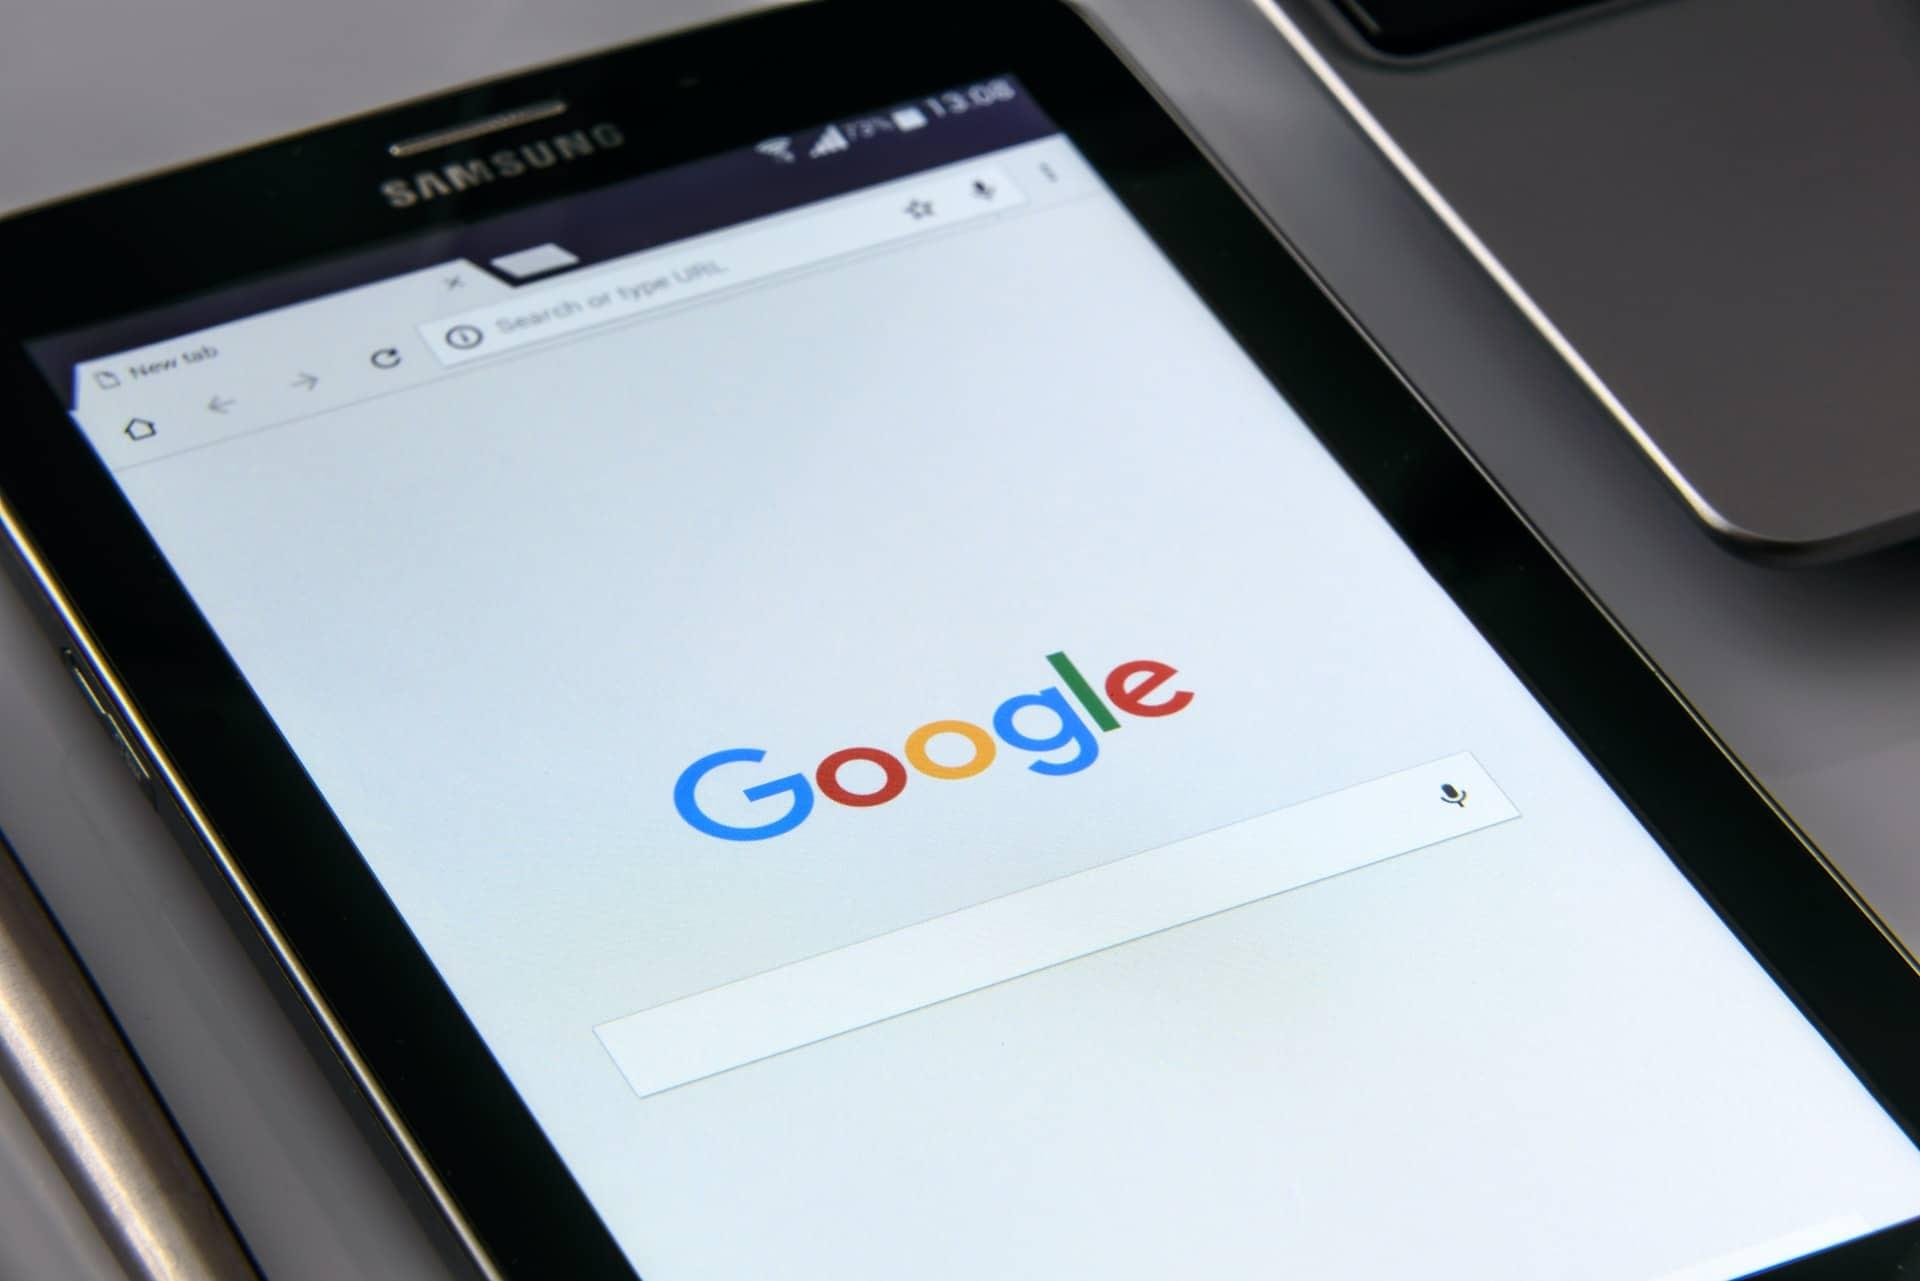 Close up of Google on Samsung device